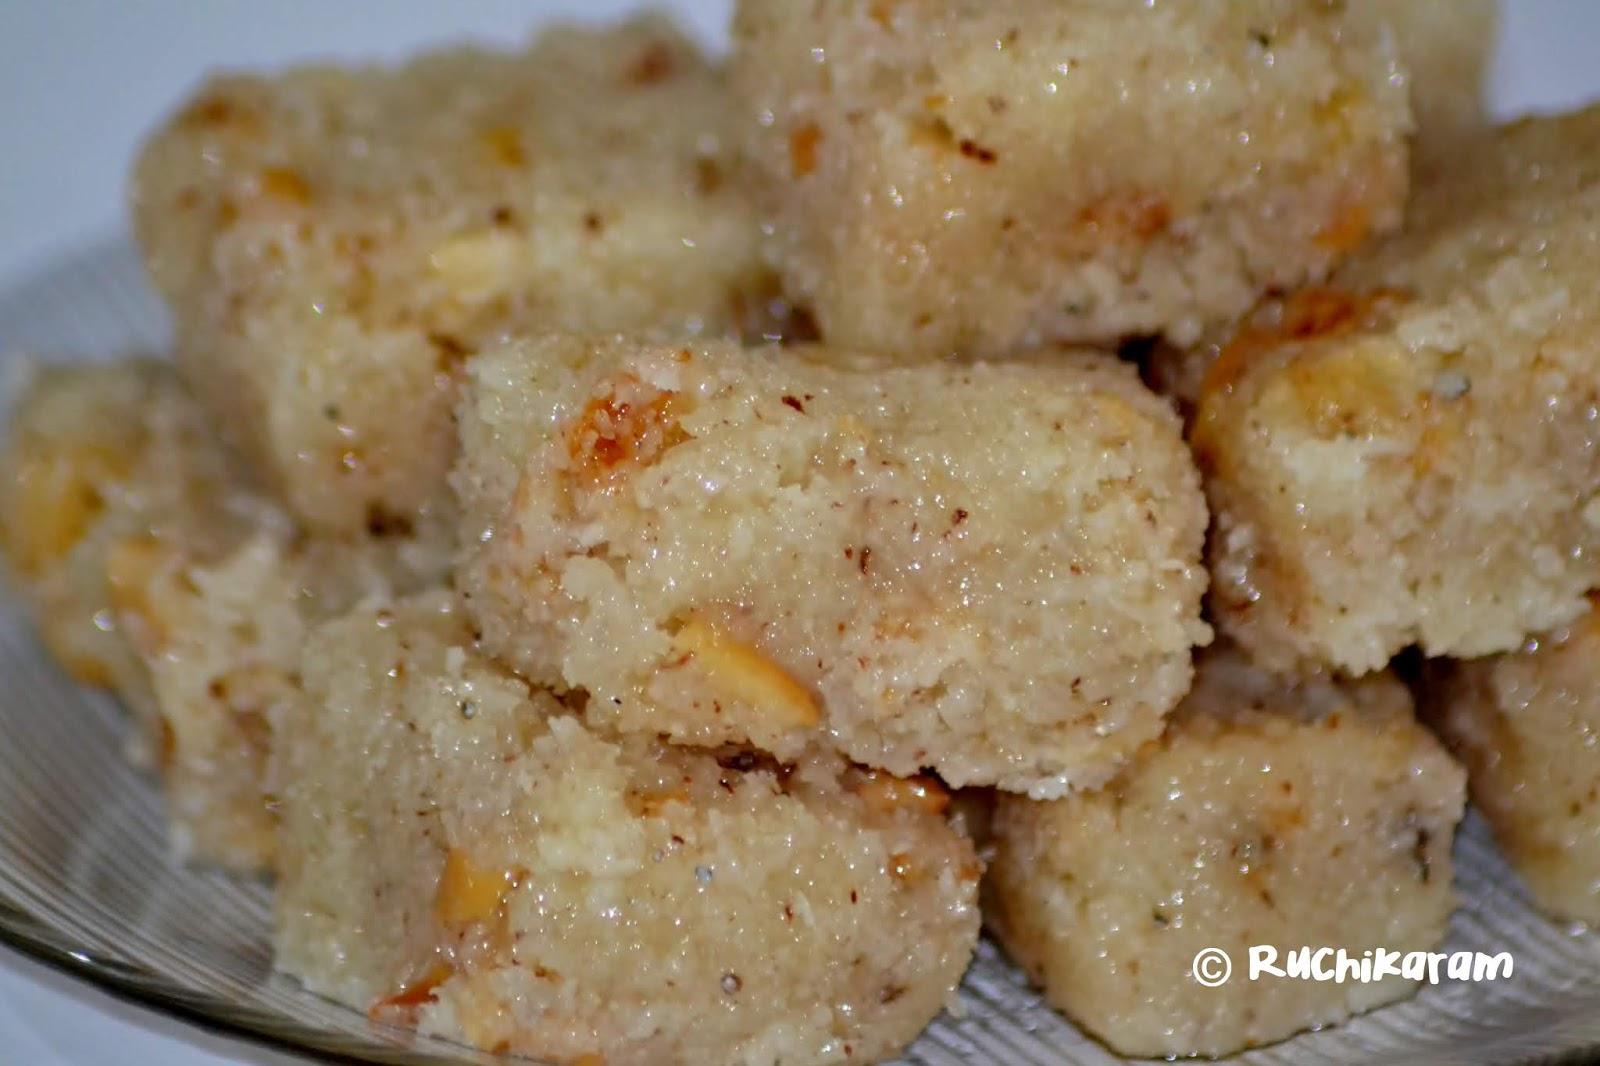 Ruchikaram: Coconut Burfi | Easy and Quick Coconut Burfi